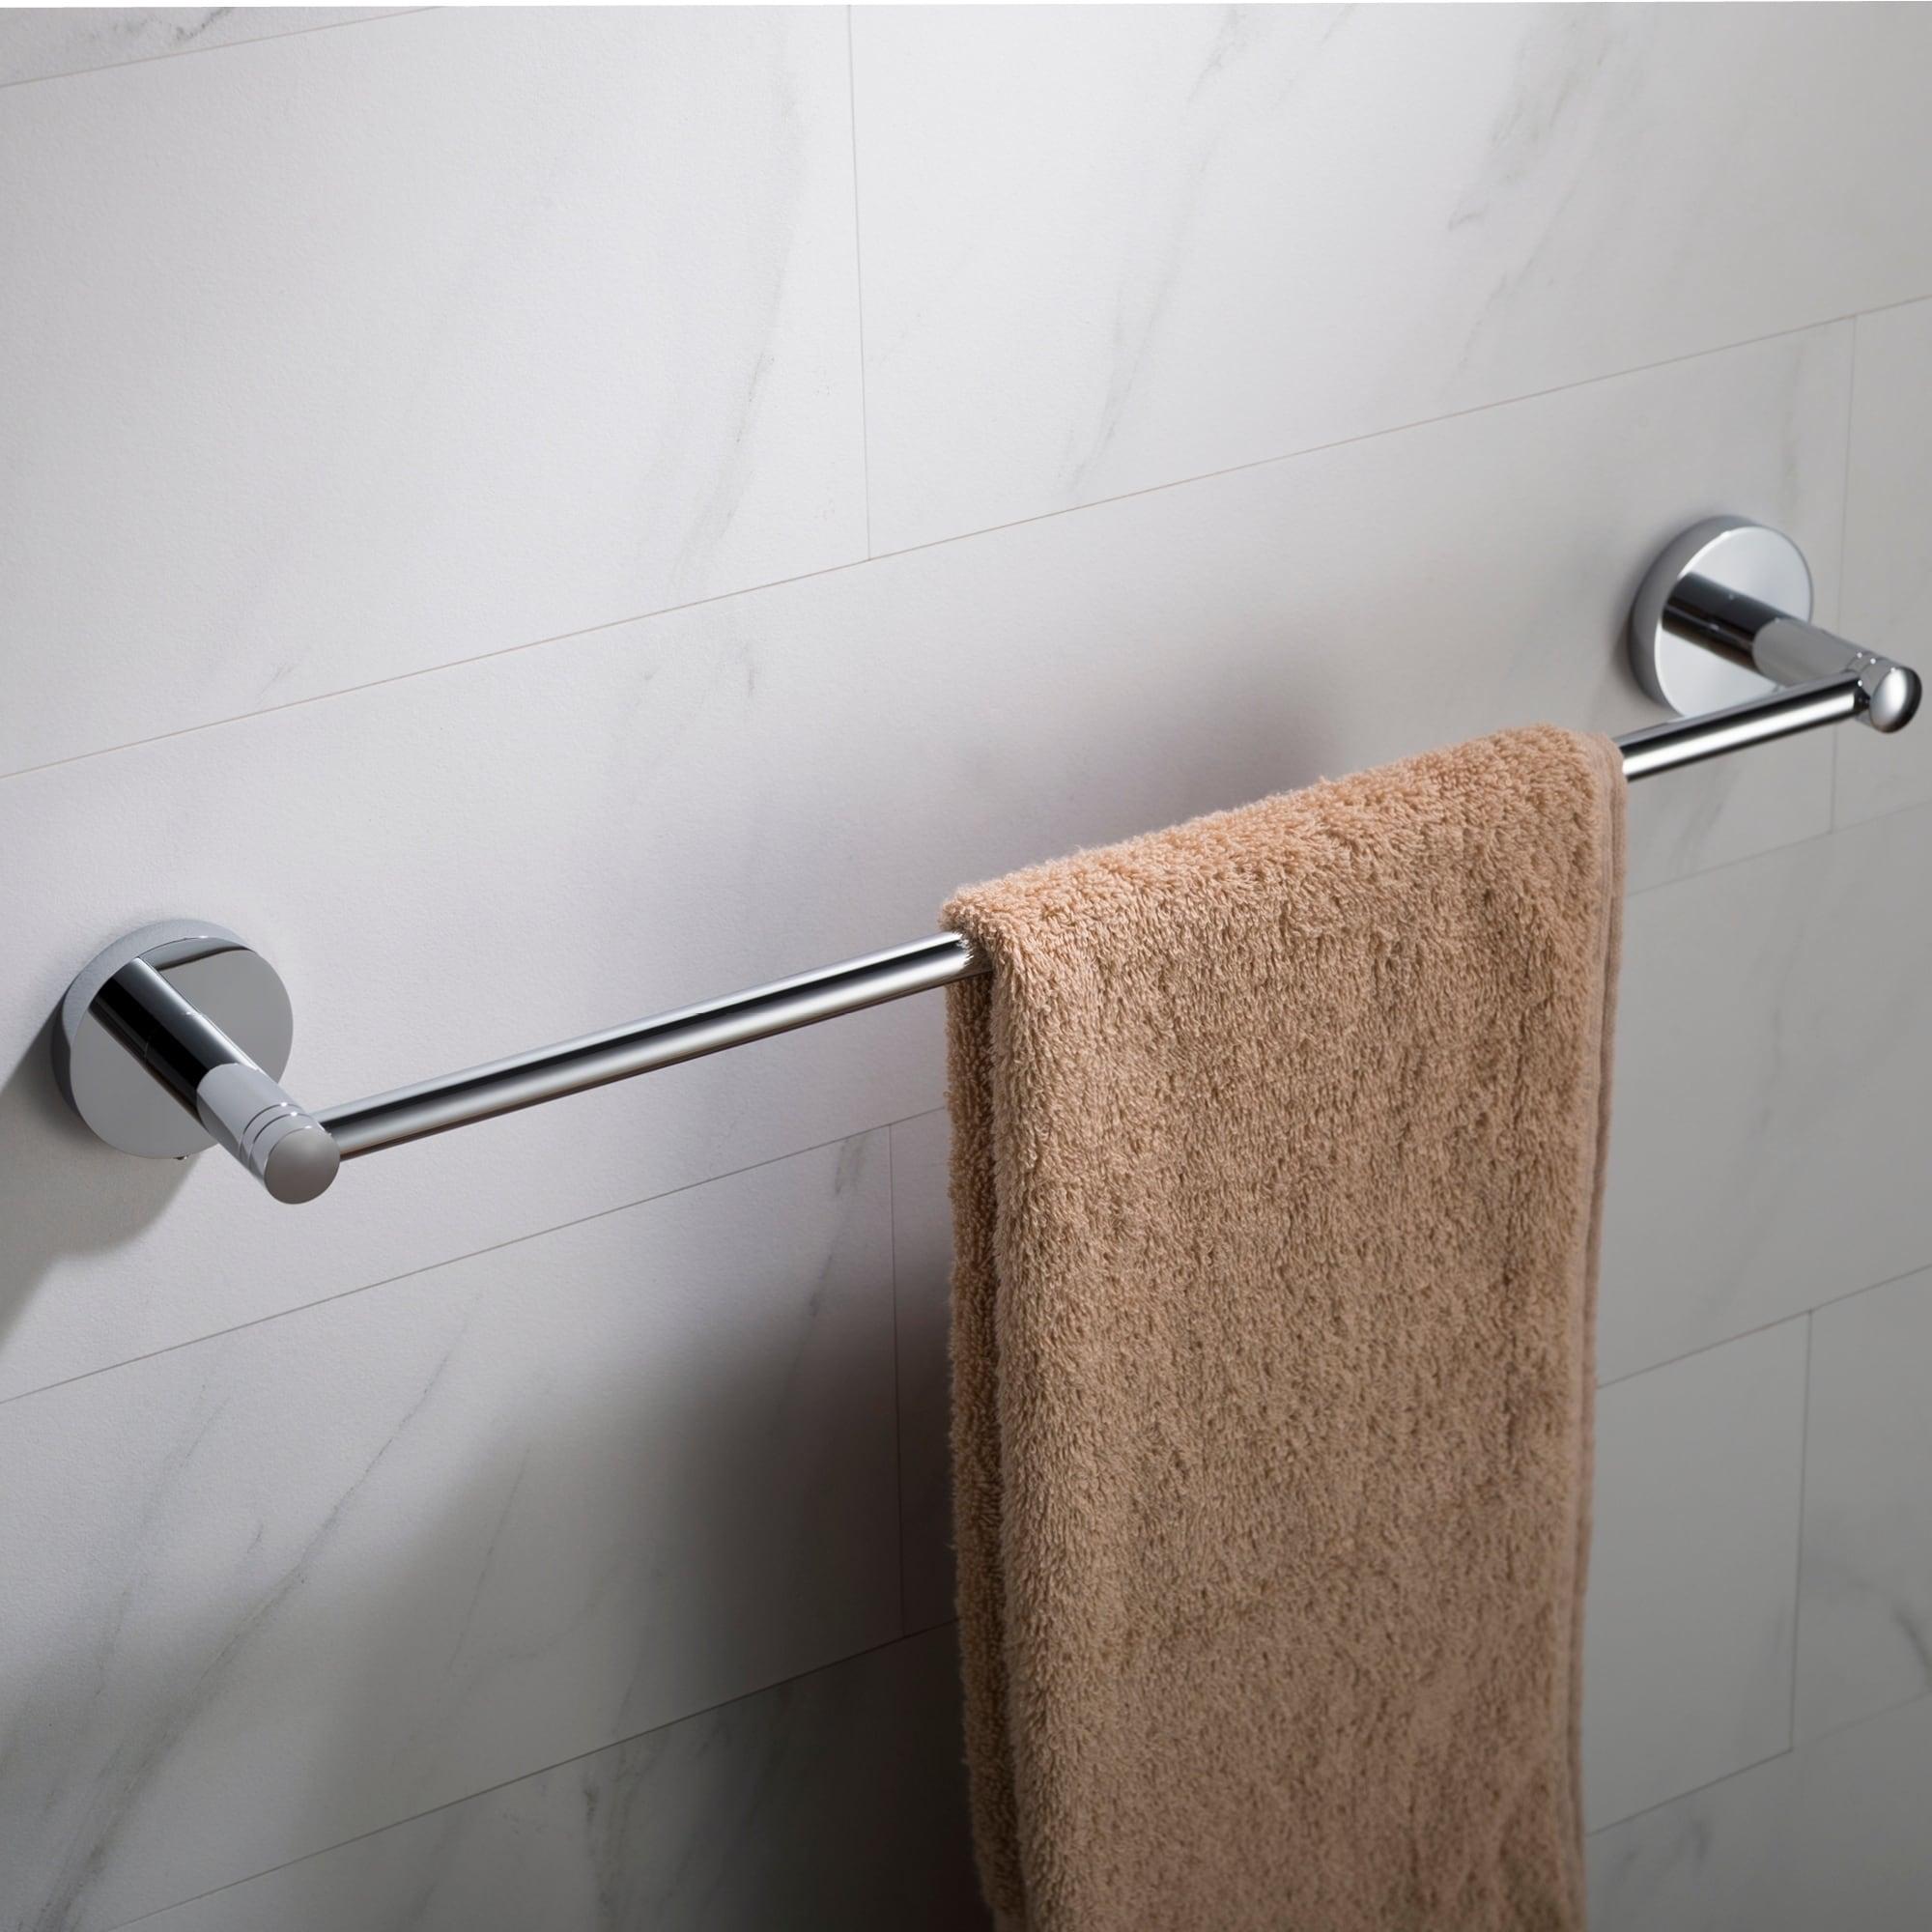 18 Inch Bathroom Towel Bar In Chrome